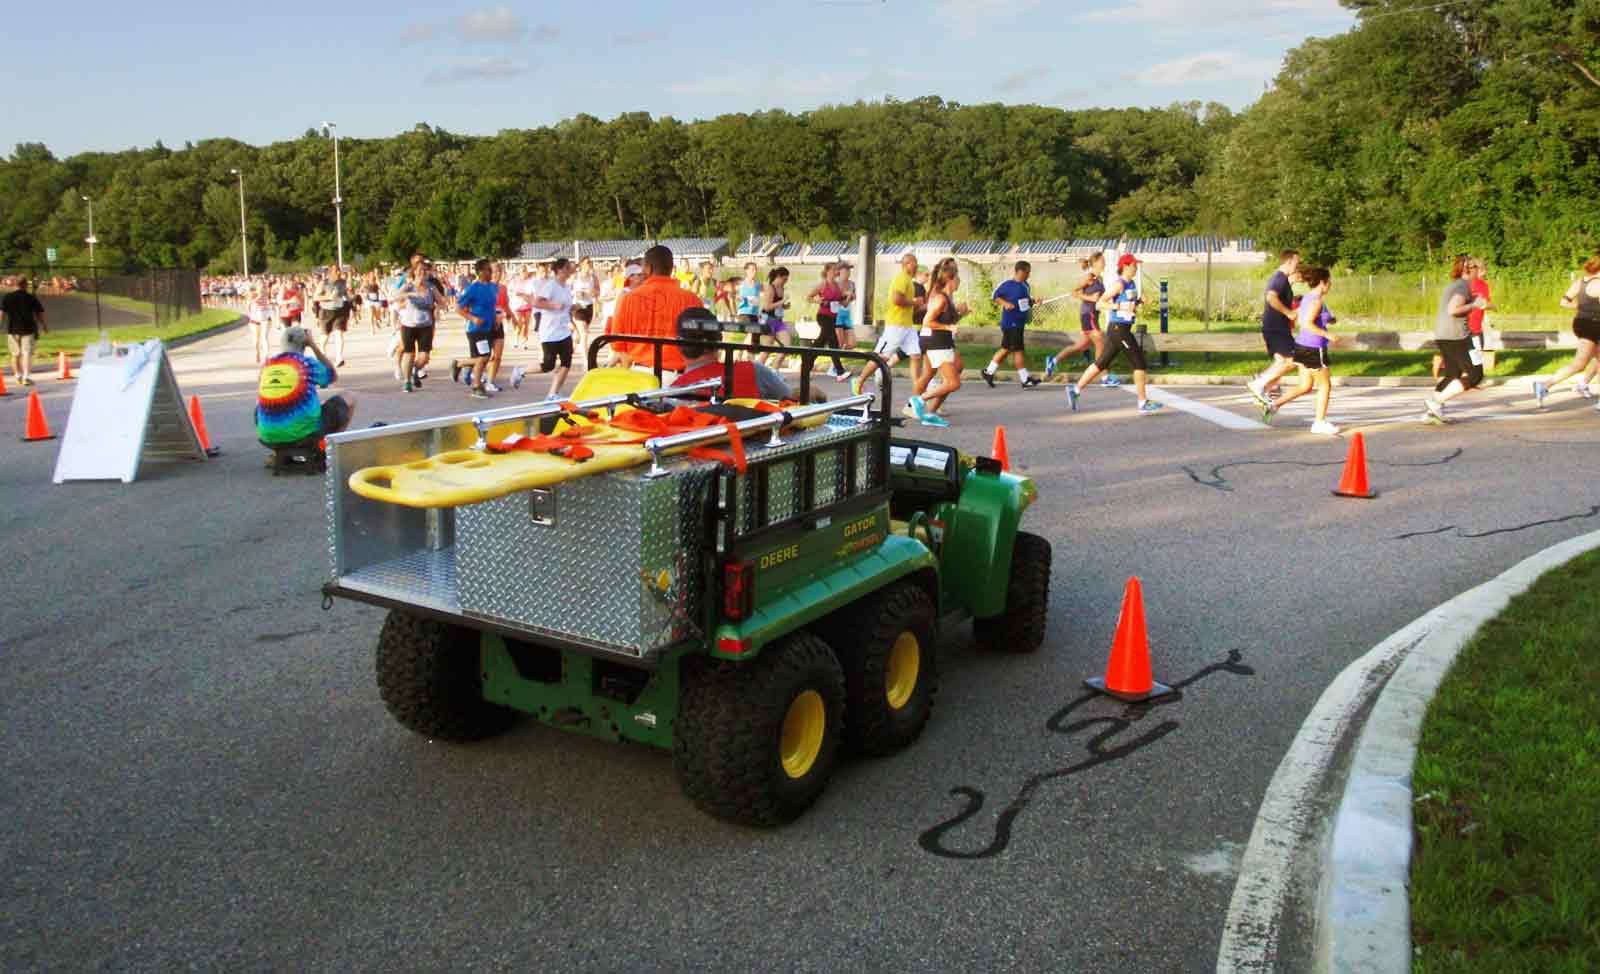 Gators at the race